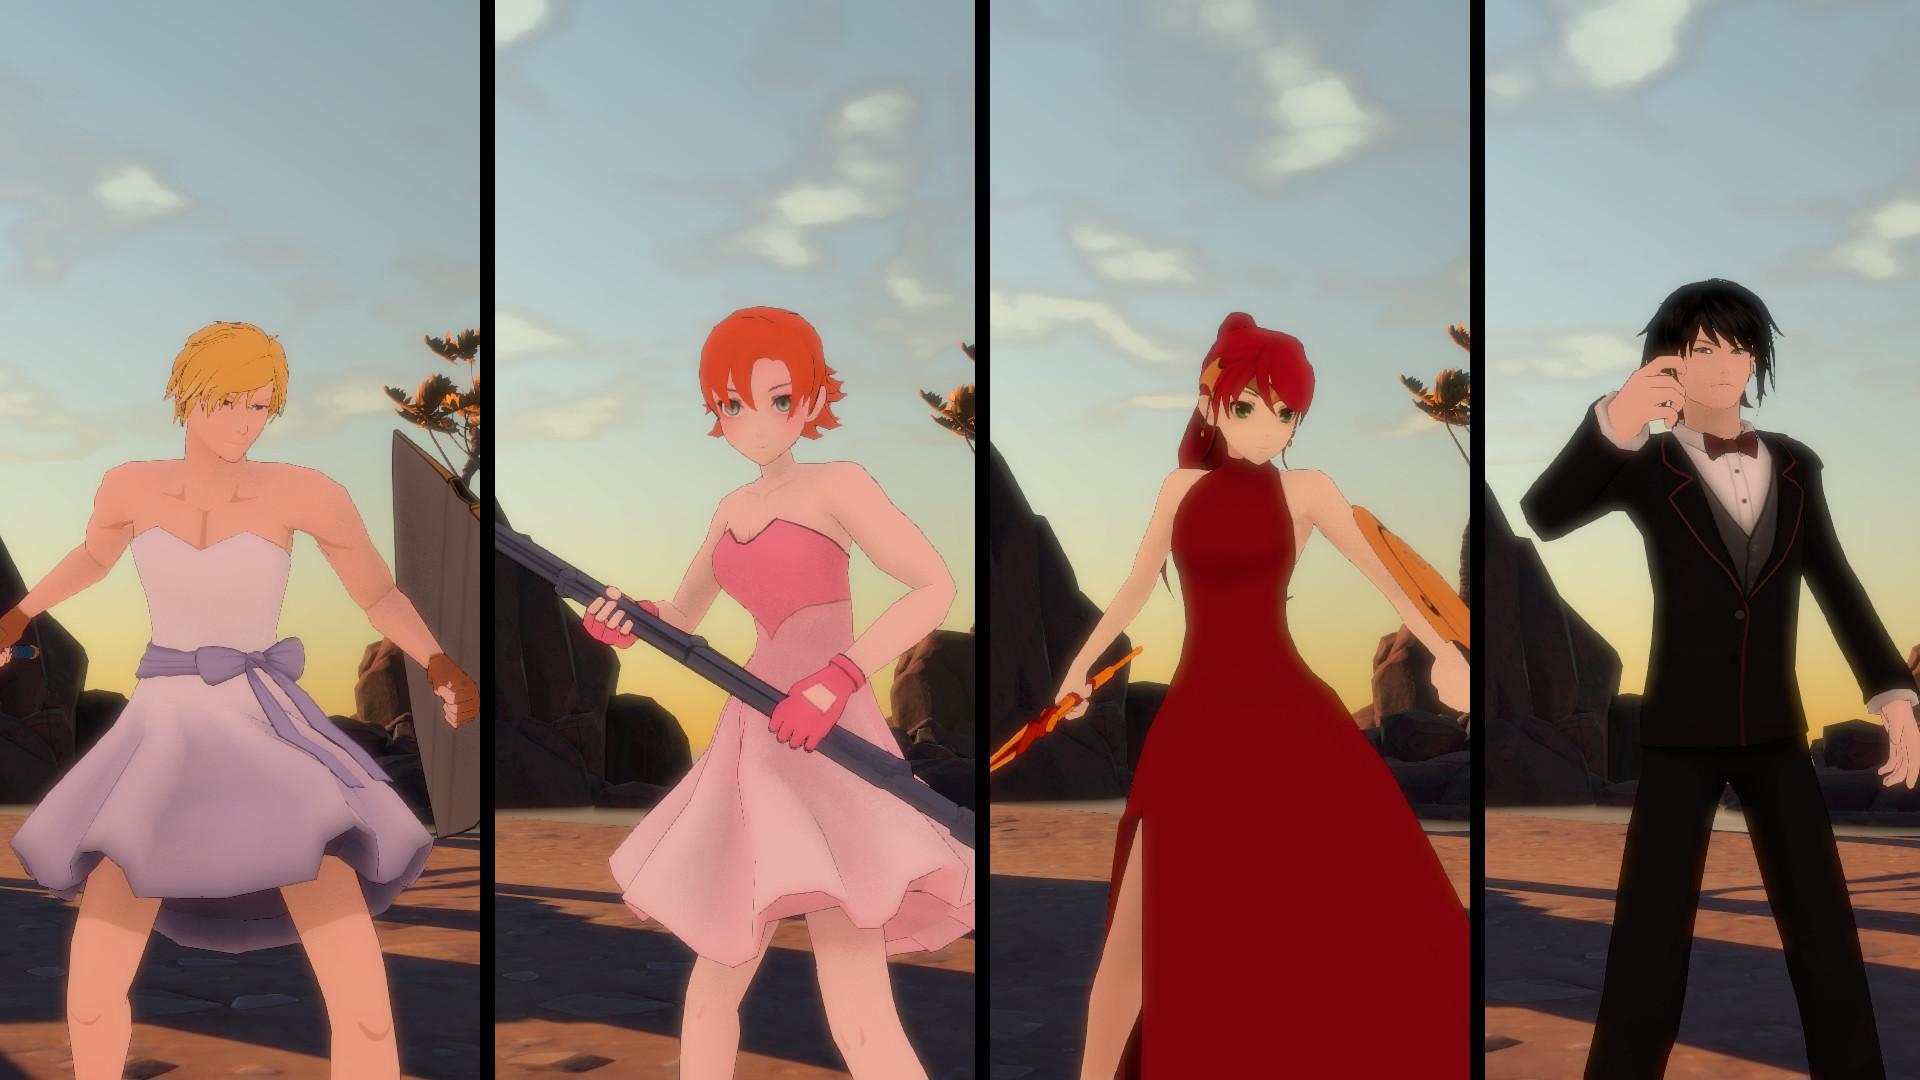 RWBY  Grimm Eclipse - Team JNPR Beacon Dance Costume Pack on Steam 058296d03